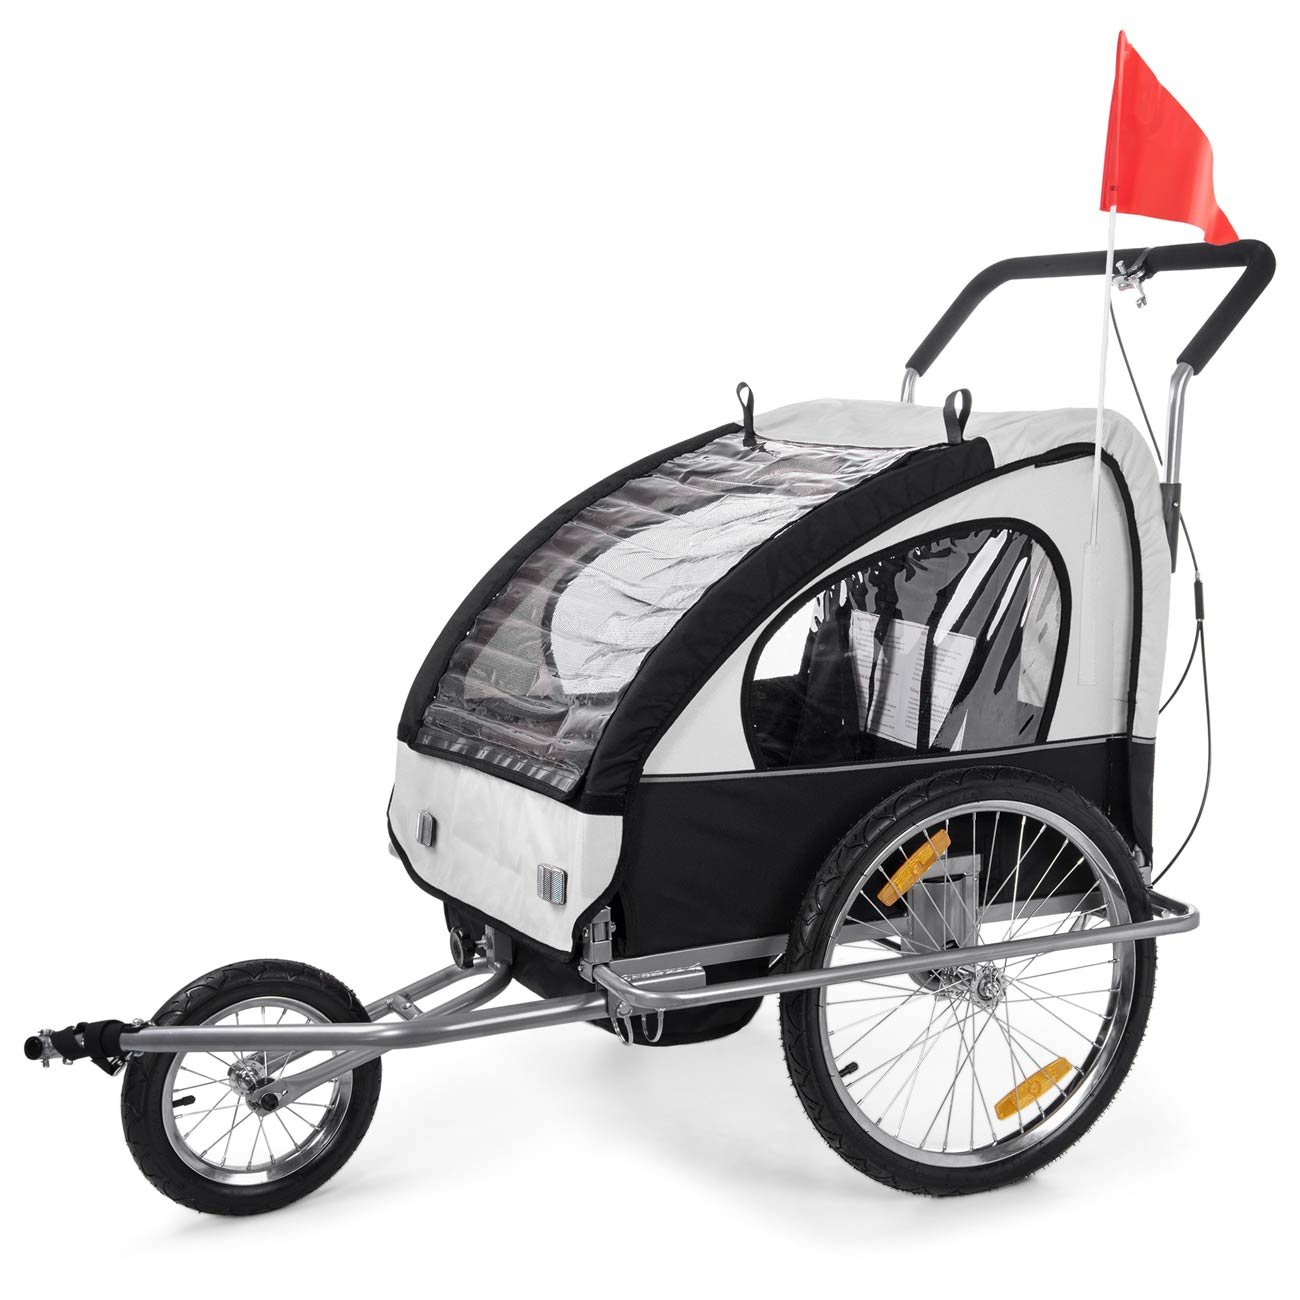 SAMAX - Cochecito infantil para remolque de bicicleta, color blanco product image